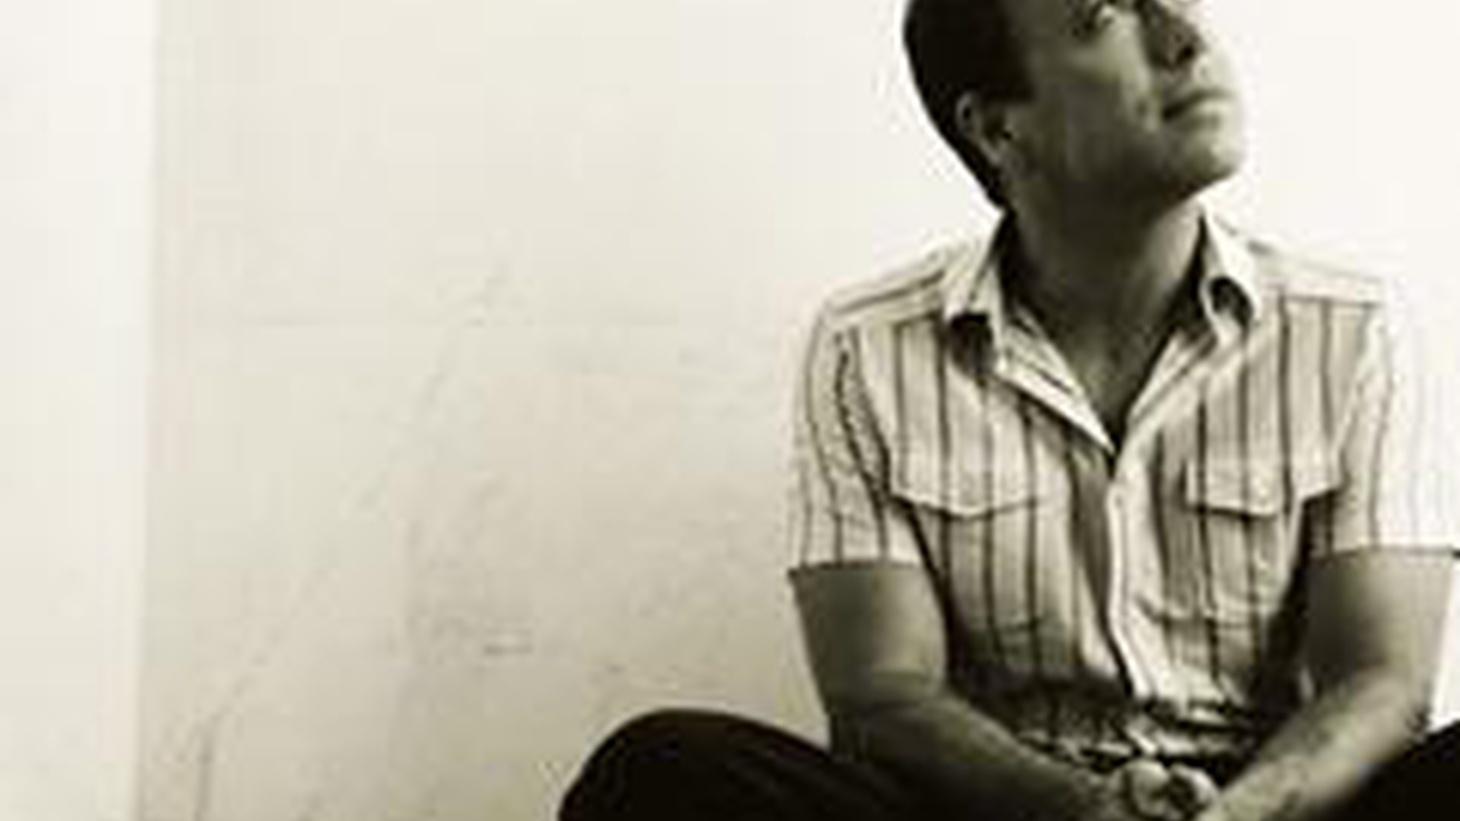 Modernist composer John Cale joins Chris Douridas in studio.